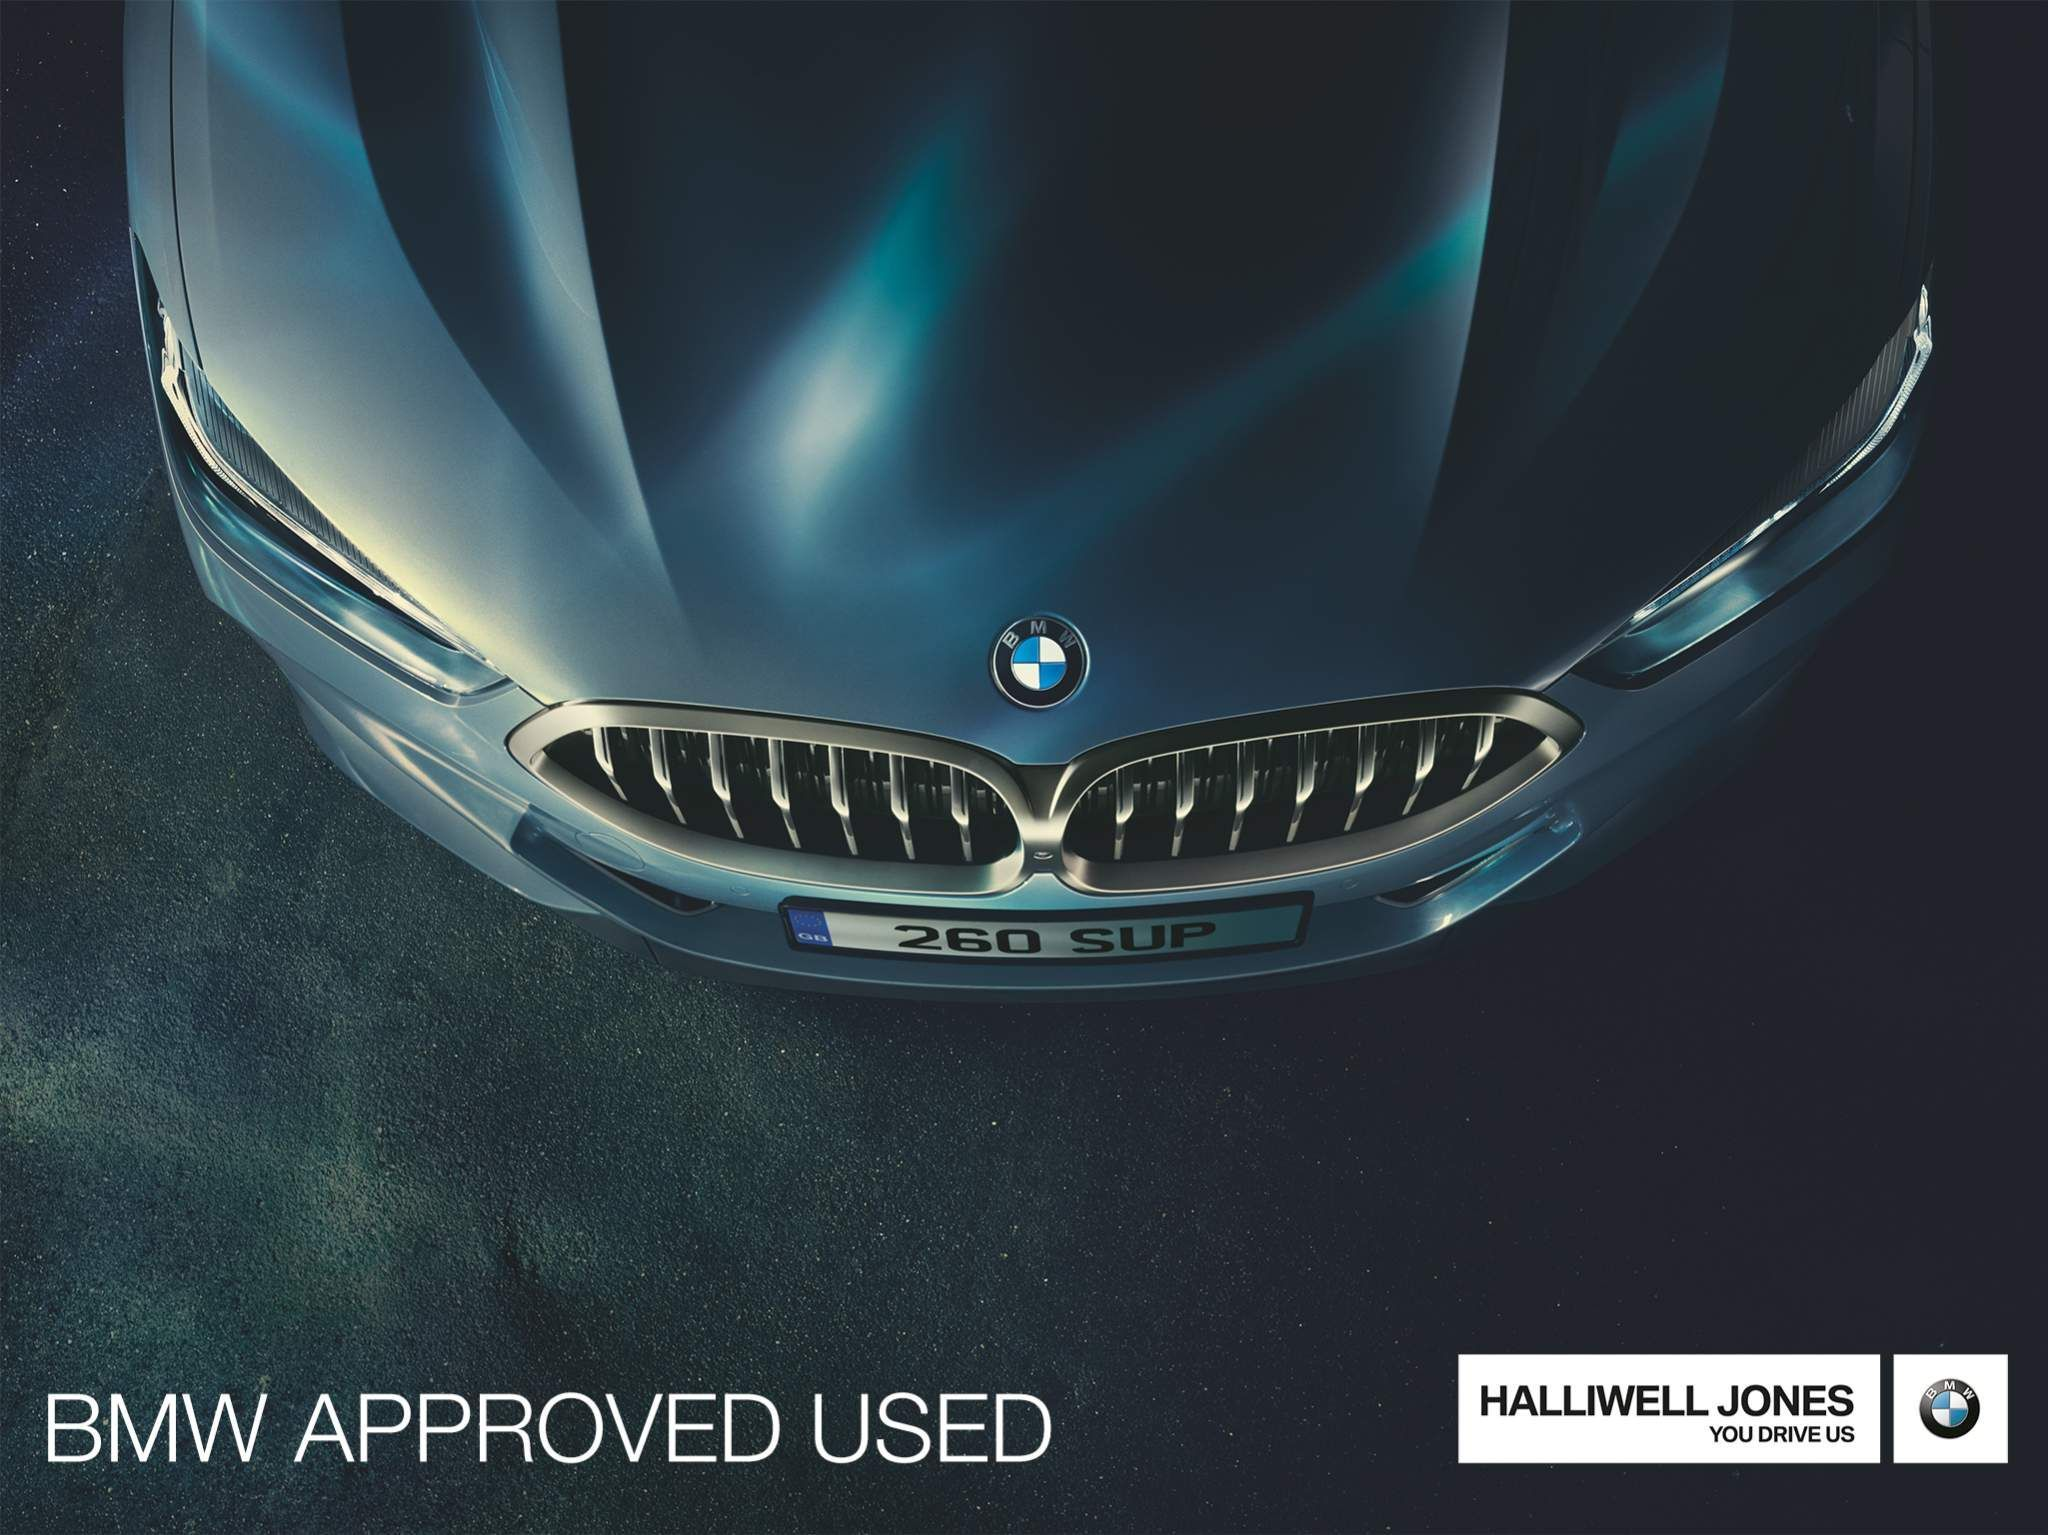 Image 1 - BMW X1 xDrive18d M Sport (CX17ZXR)